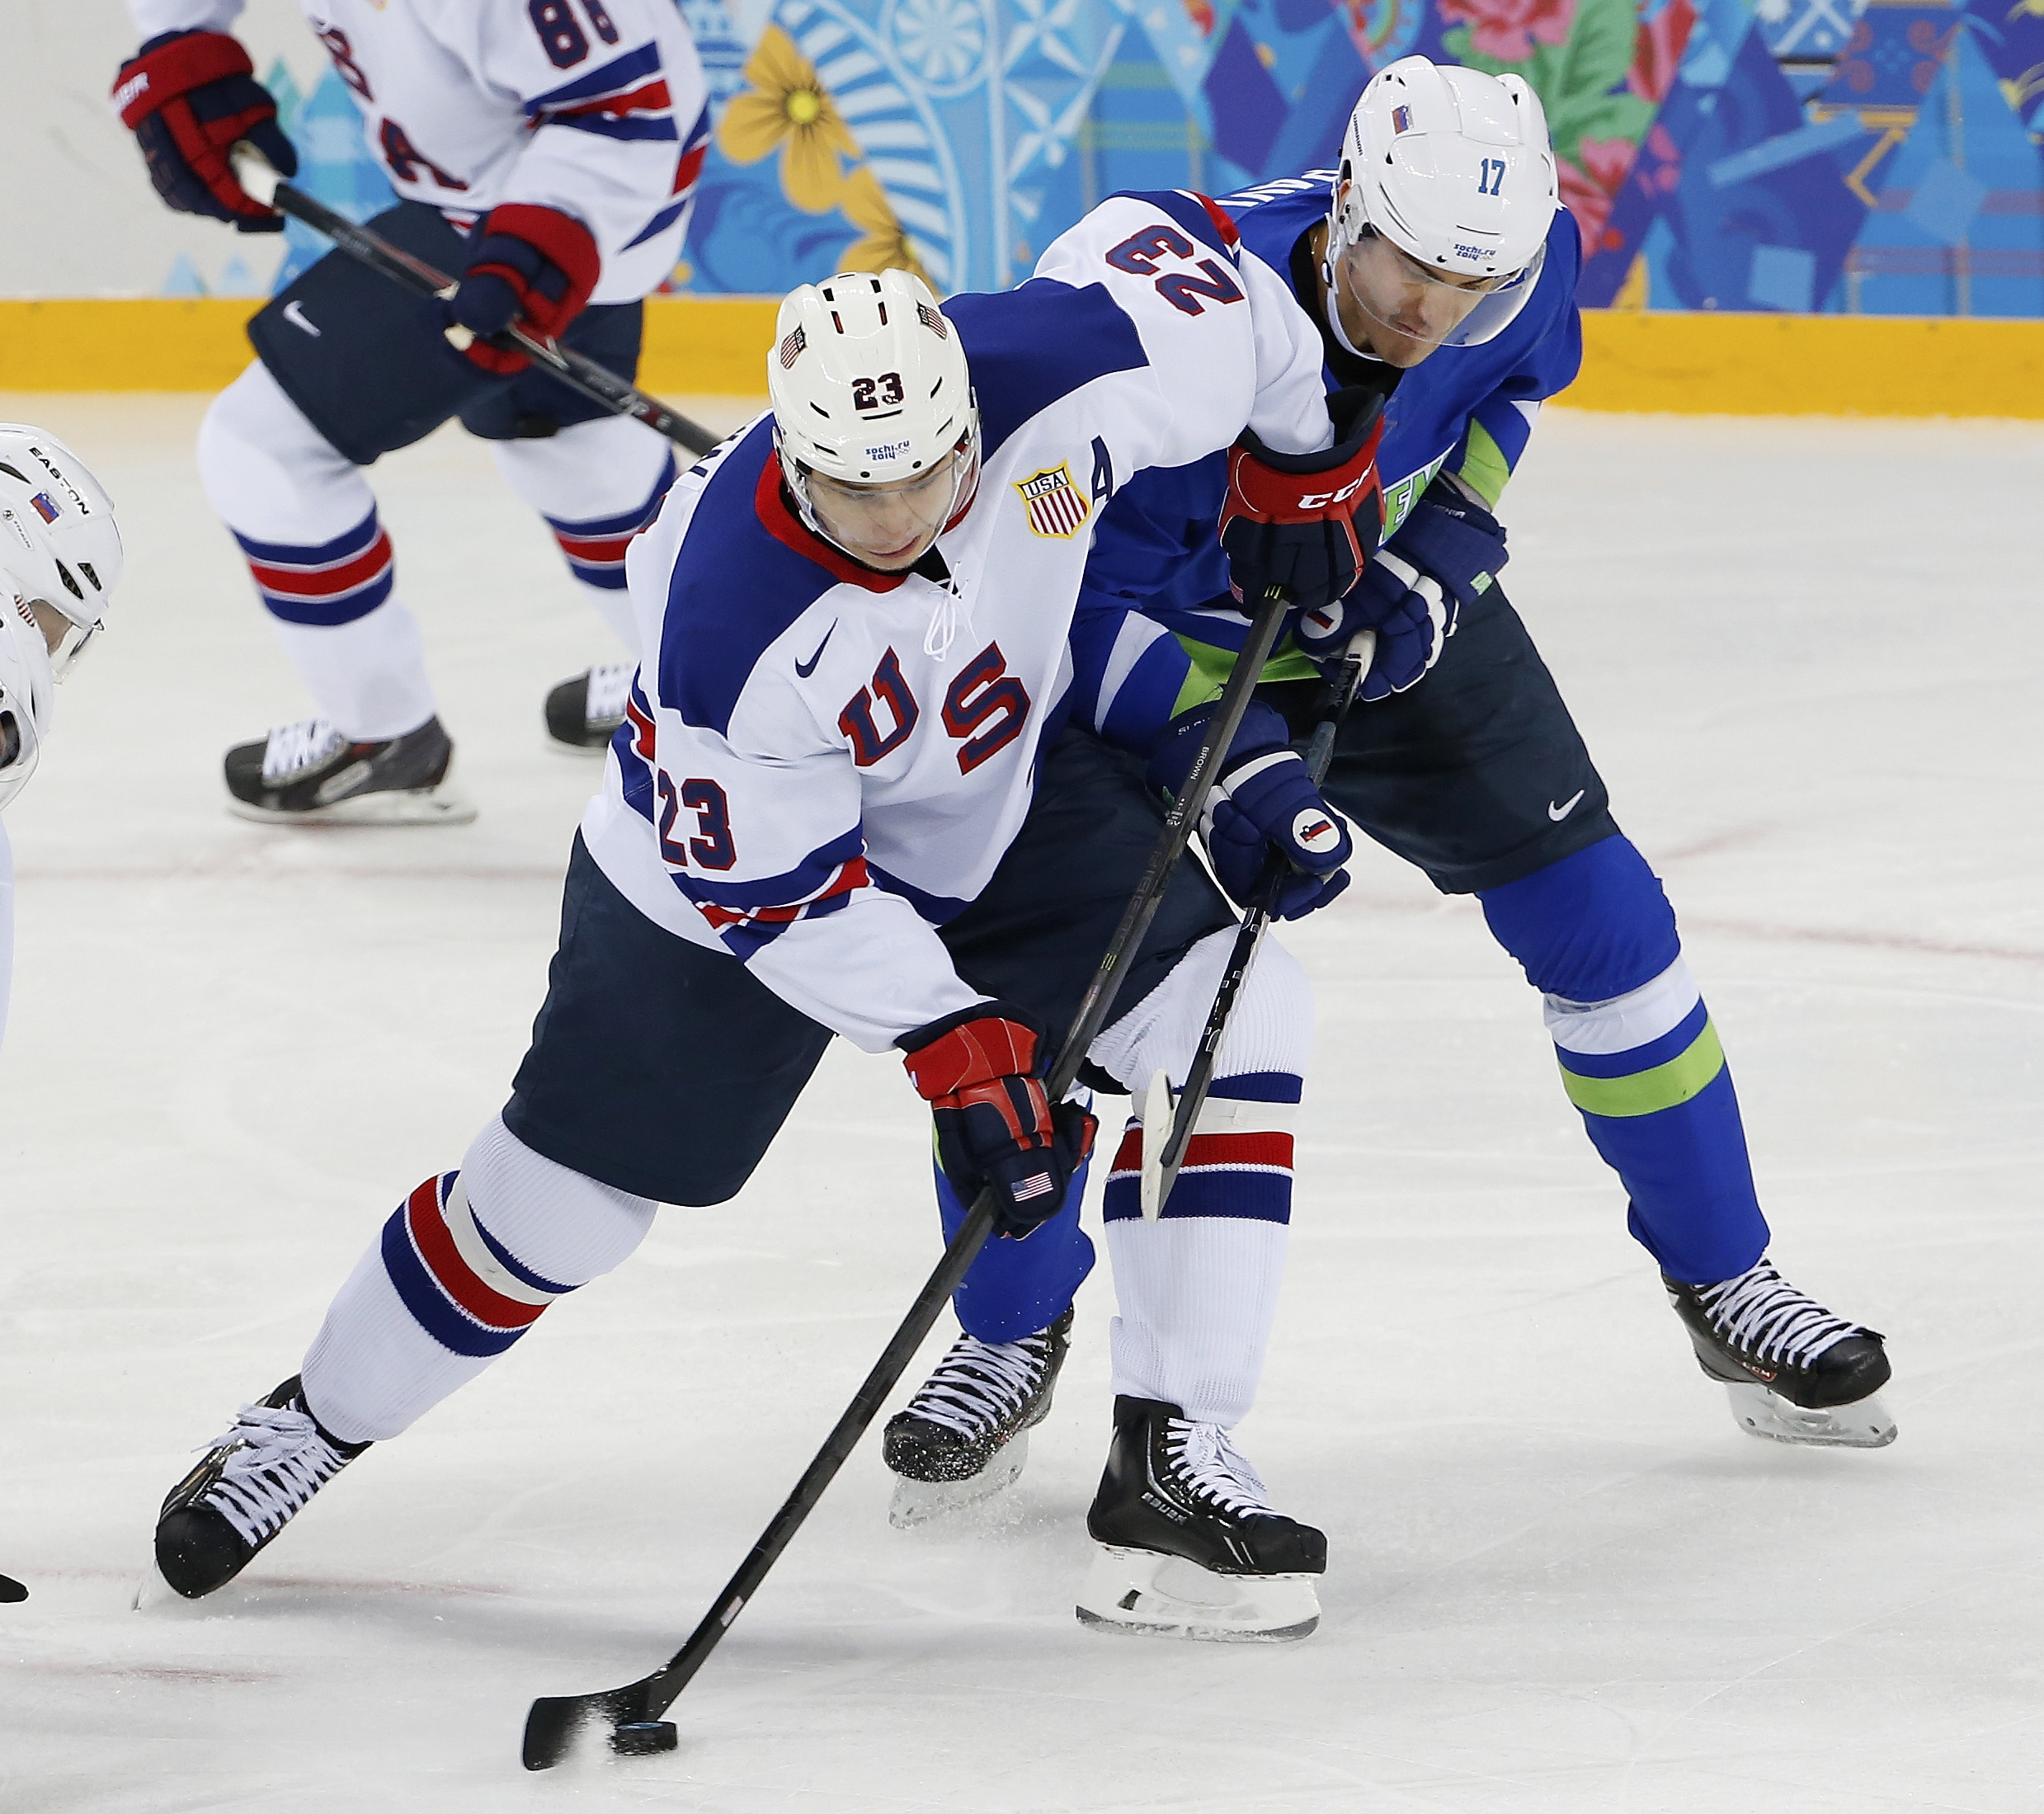 USA forward Dustin Brown takes control of the puck away from Slovenia defenseman Ziga Pavlin during the 2014 Winter Olympics men's ice hockey game at Shayba Arena Sunday, Feb. 16, 2014, in Sochi, Russia. (AP Photo/Petr David Josek)